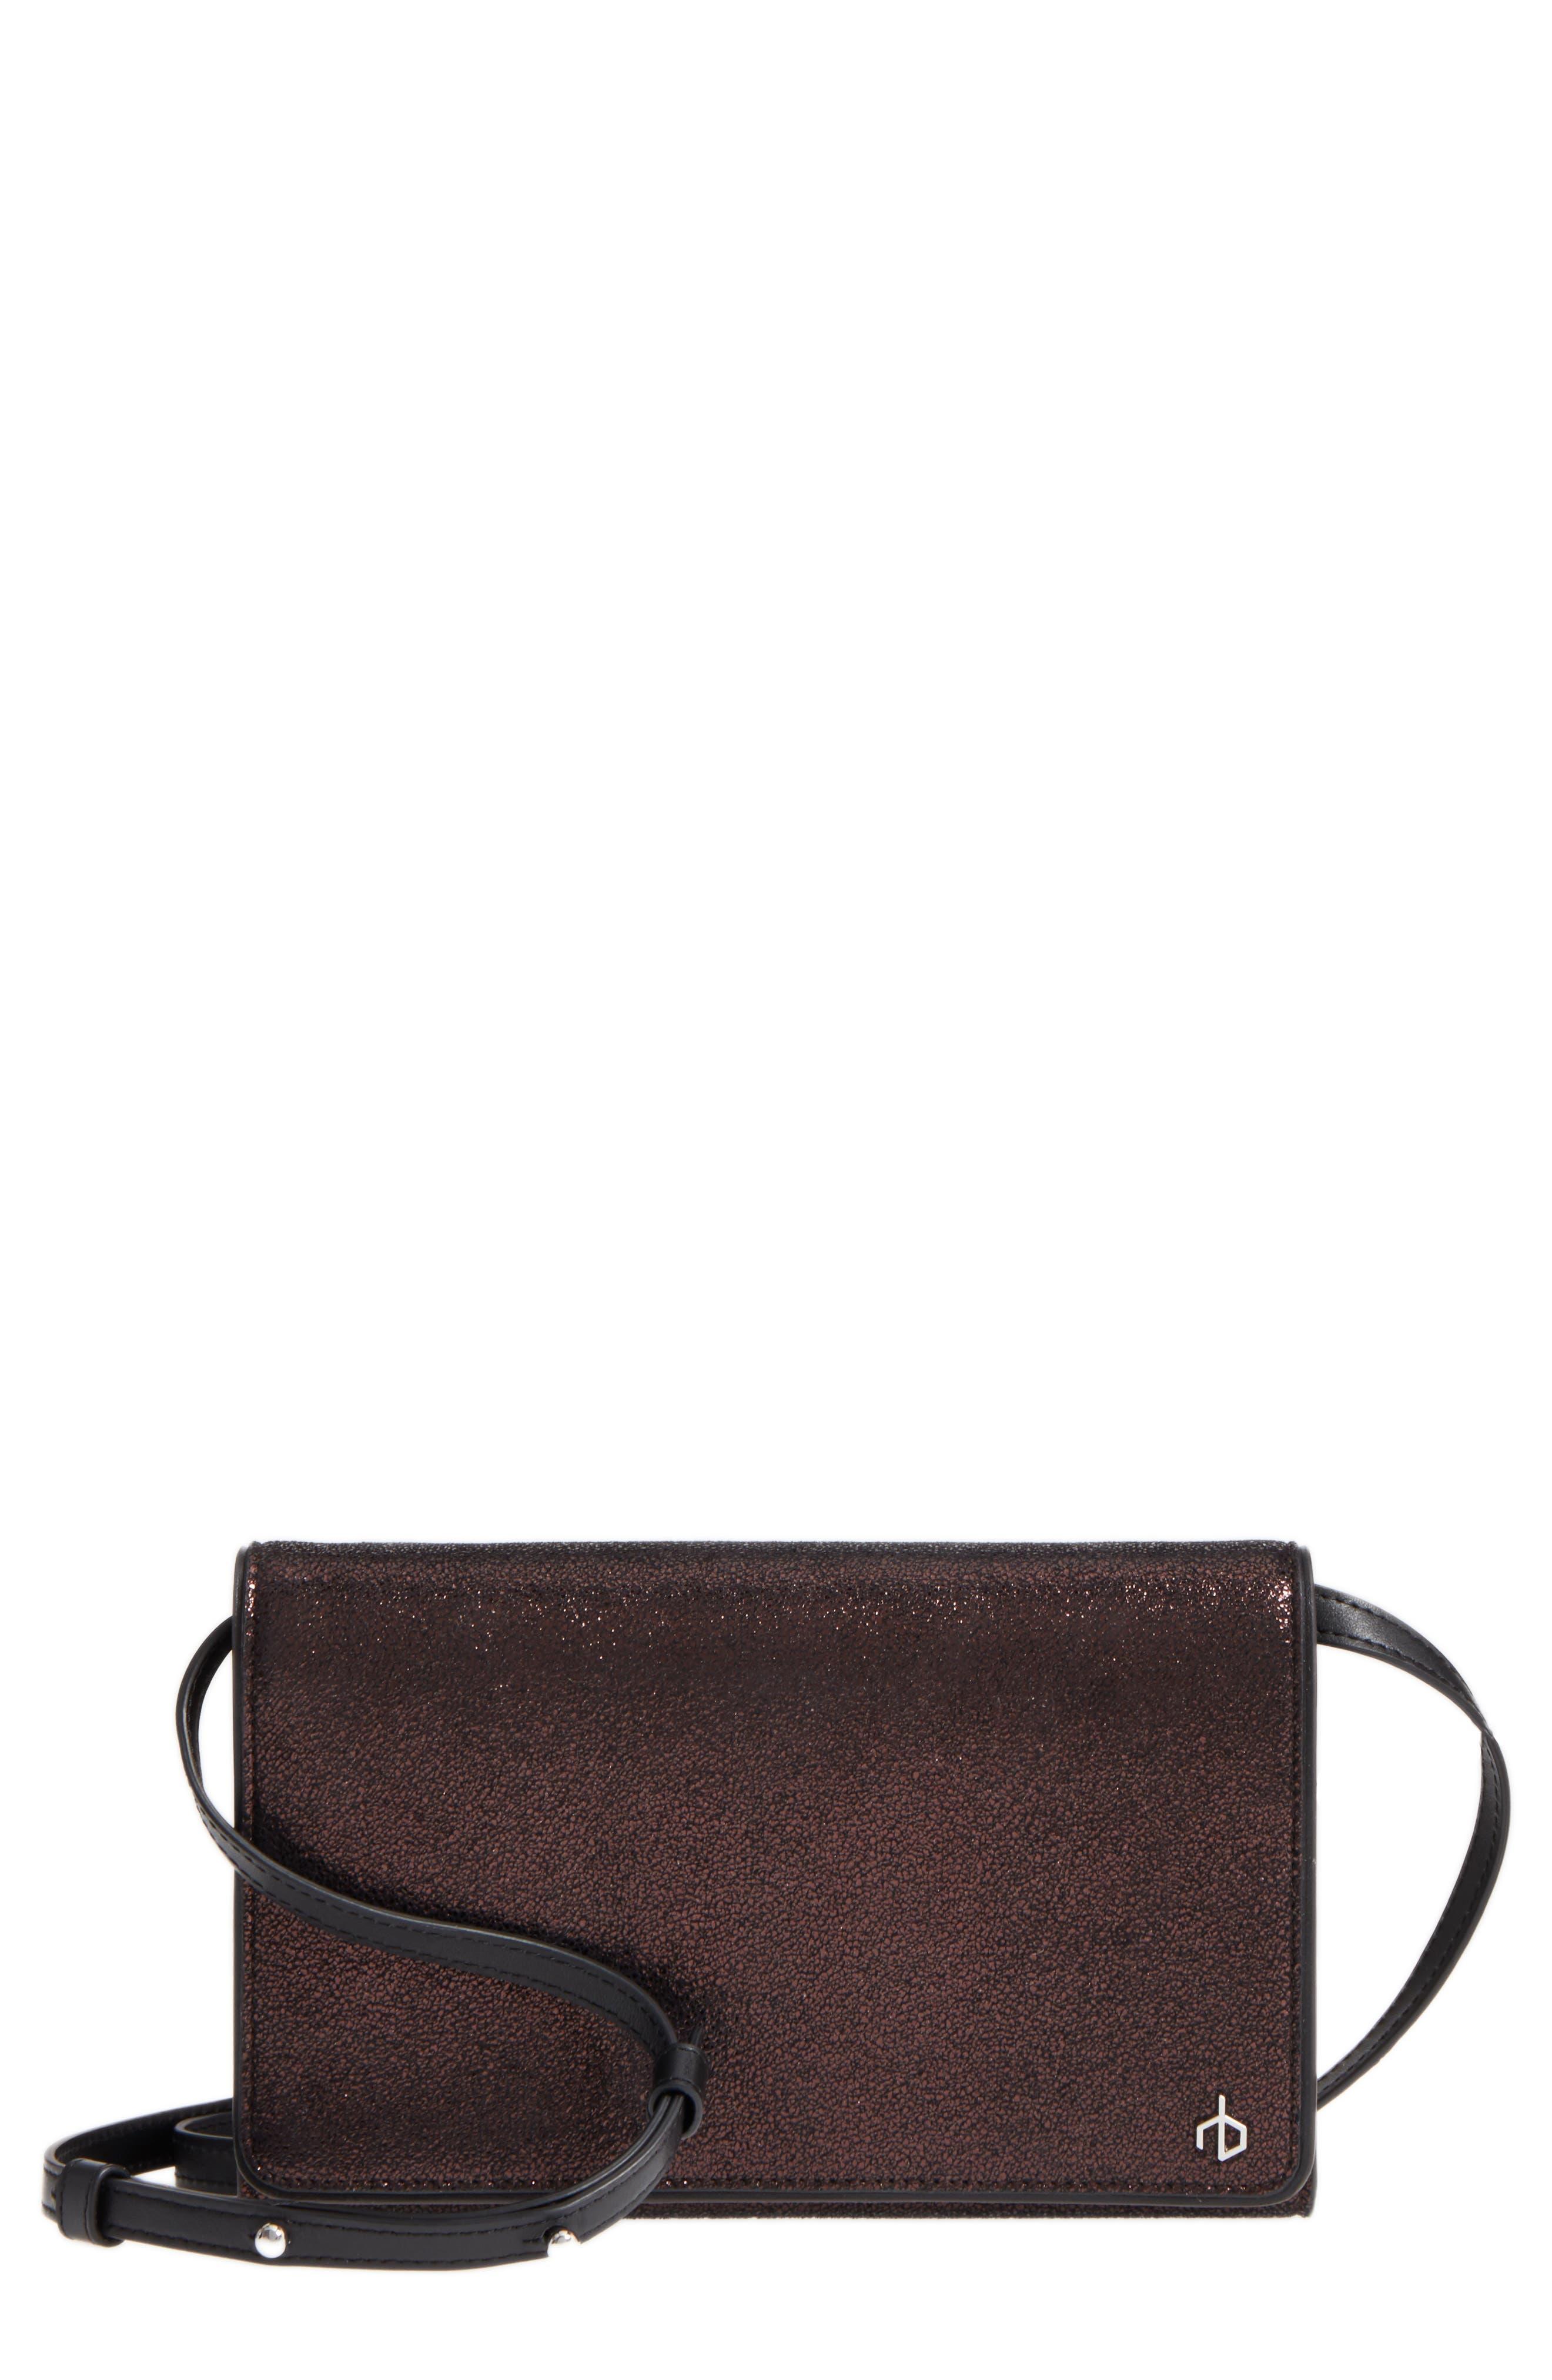 Metallic Leather Crossbody Wallet,                         Main,                         color, Copper